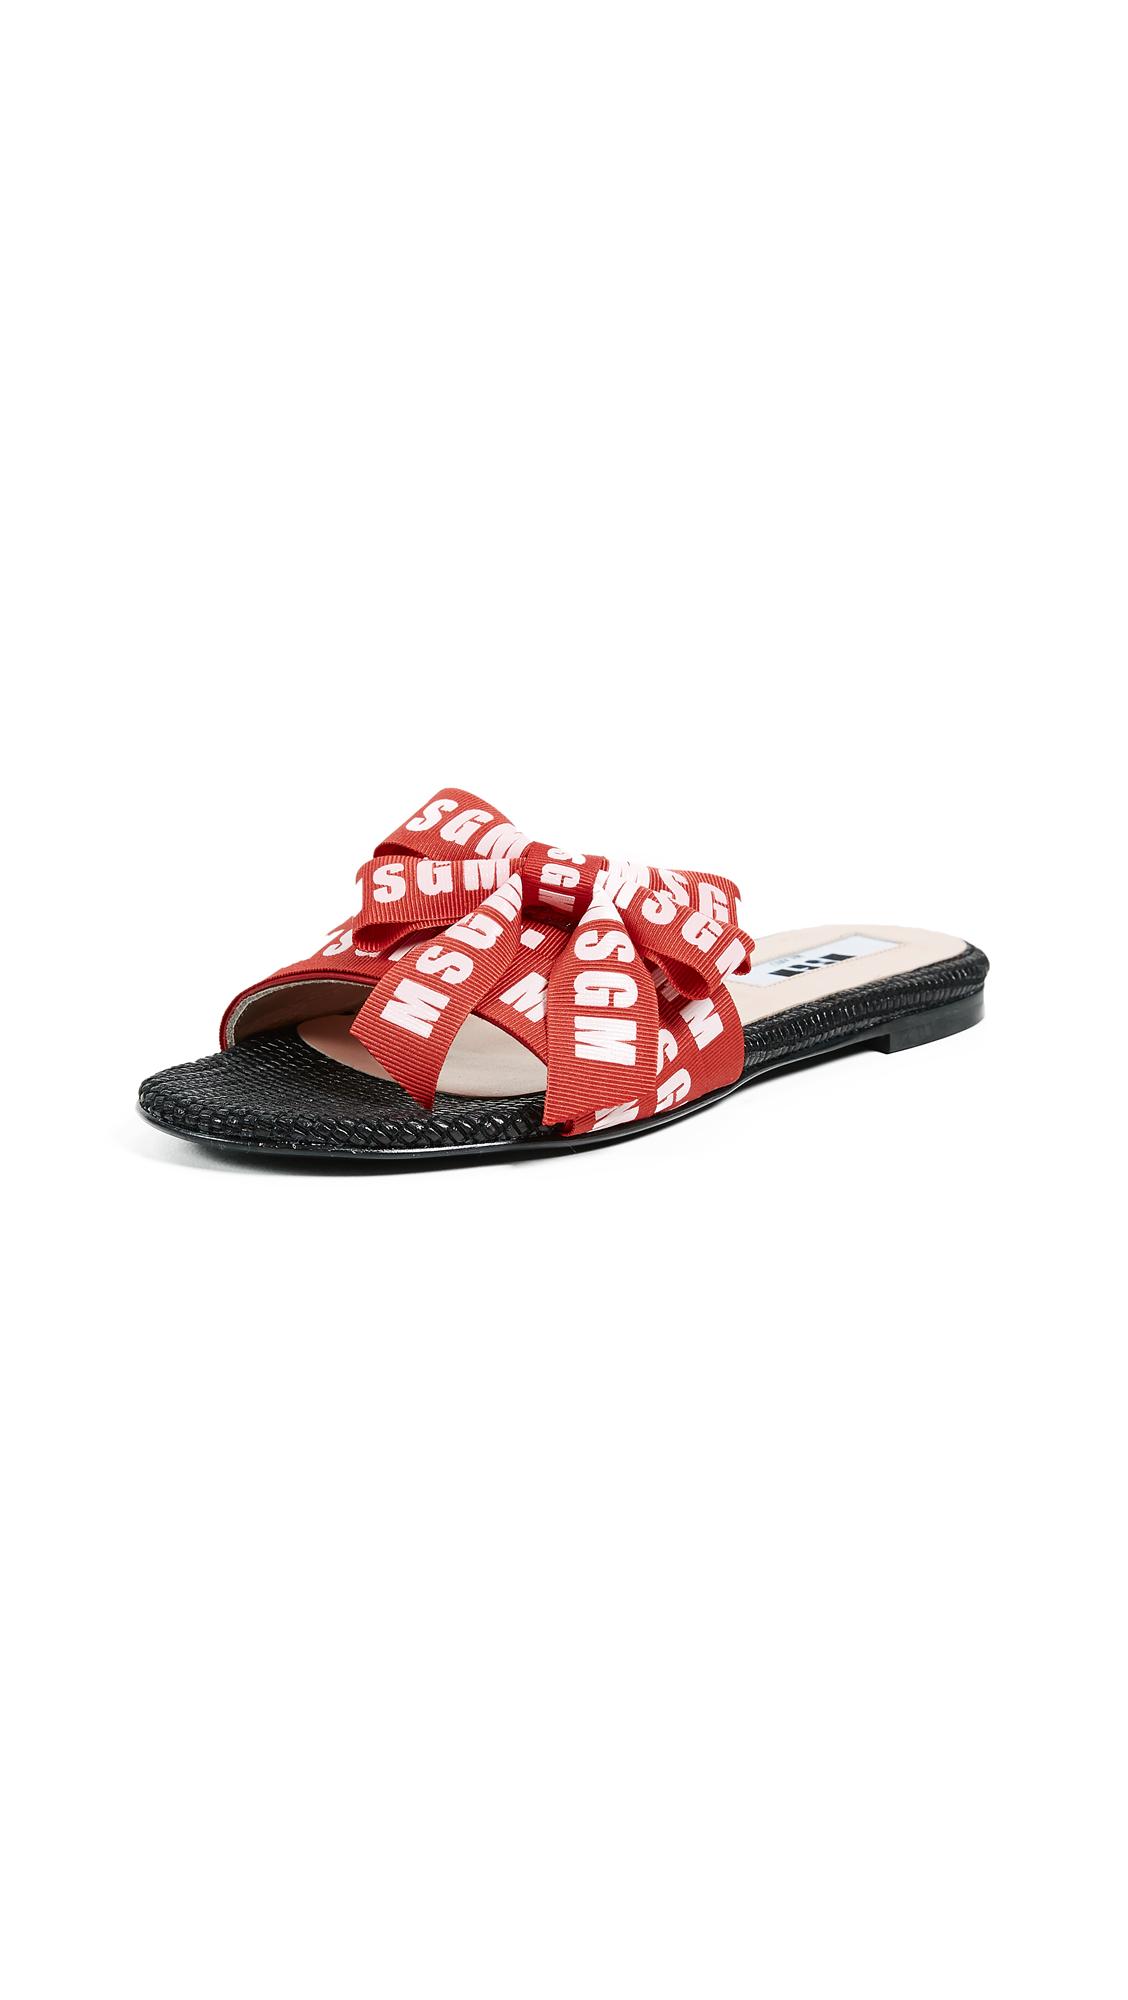 MSGM Logo Multi Strap Slipper Slides - Black/Red